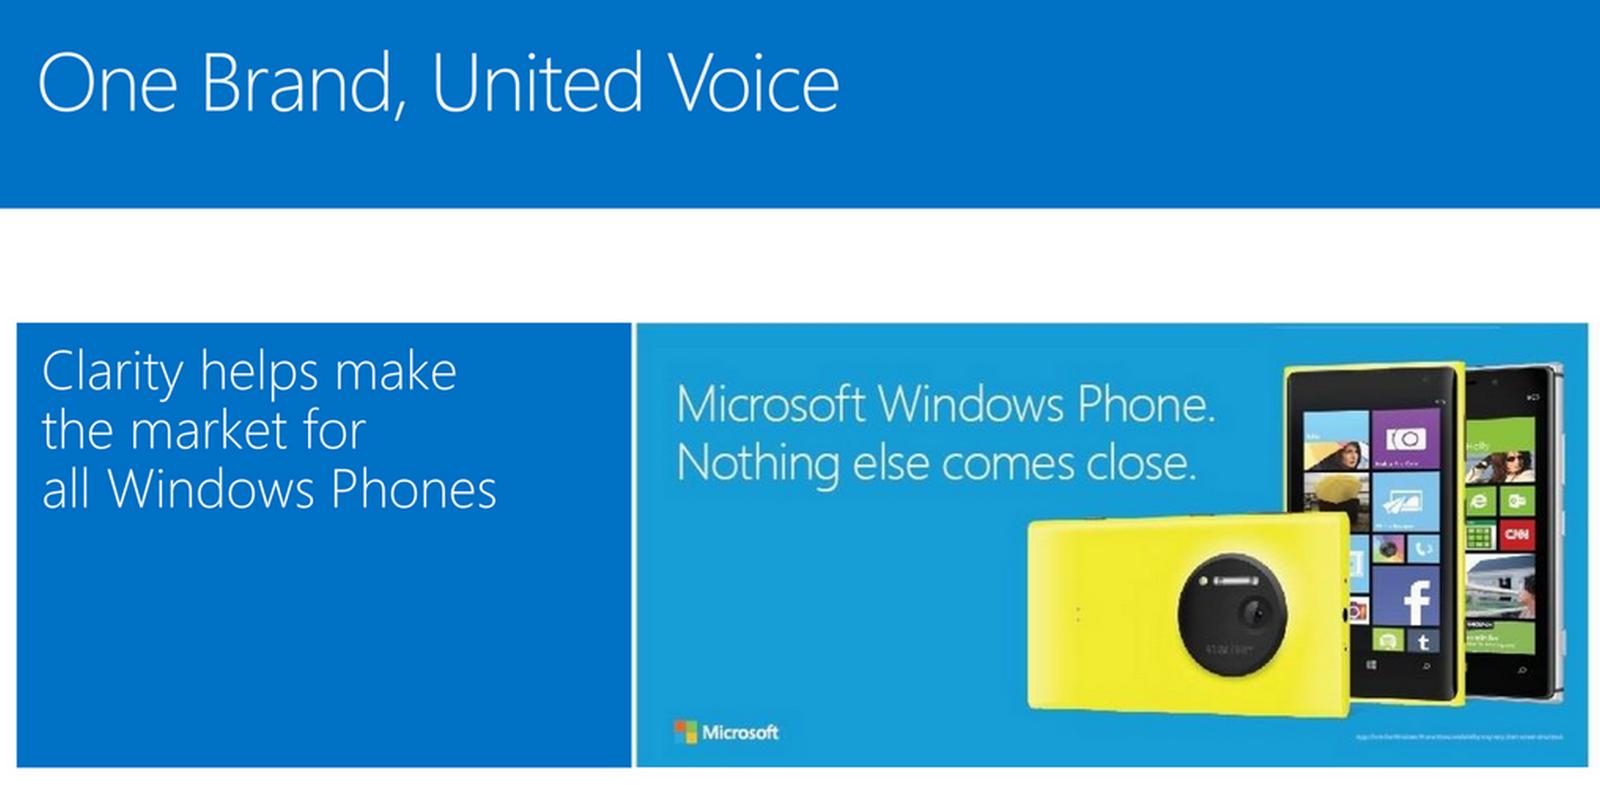 Microsoft and Nokia: No Surprises